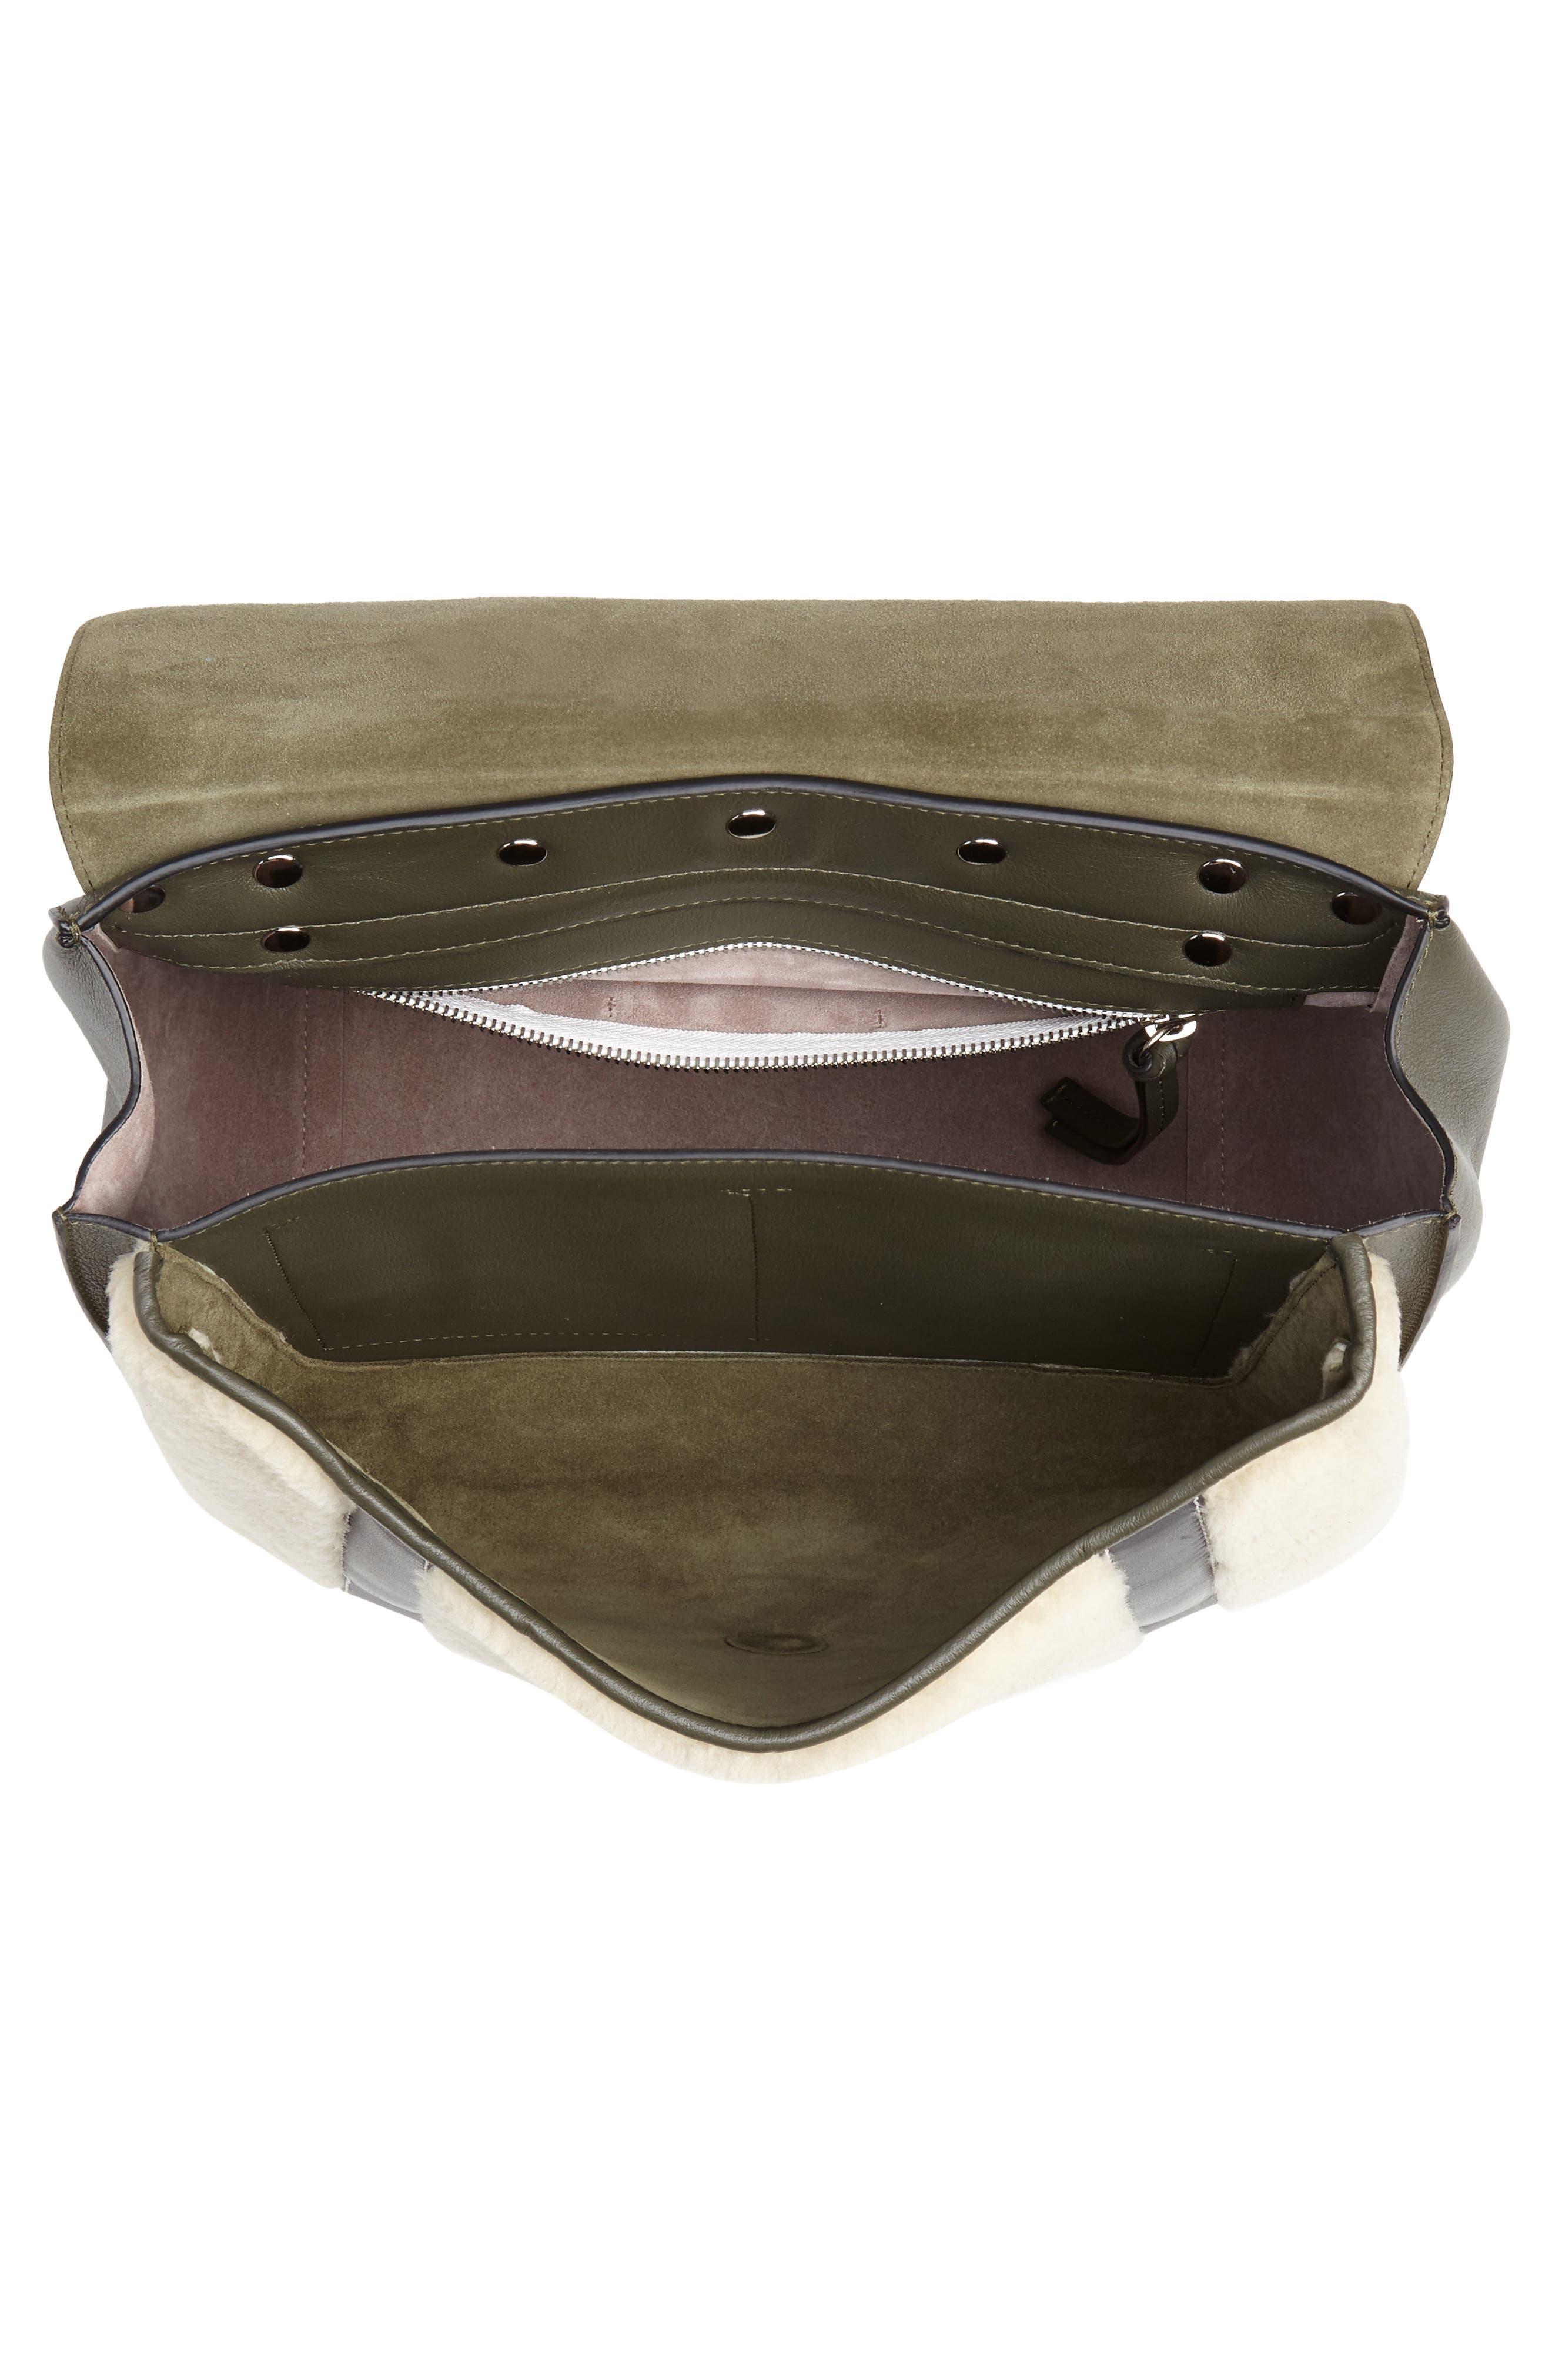 JW ANDERSON,                             Large Disc Leather & Genuine Shearling Satchel,                             Alternate thumbnail 4, color,                             KHAKI